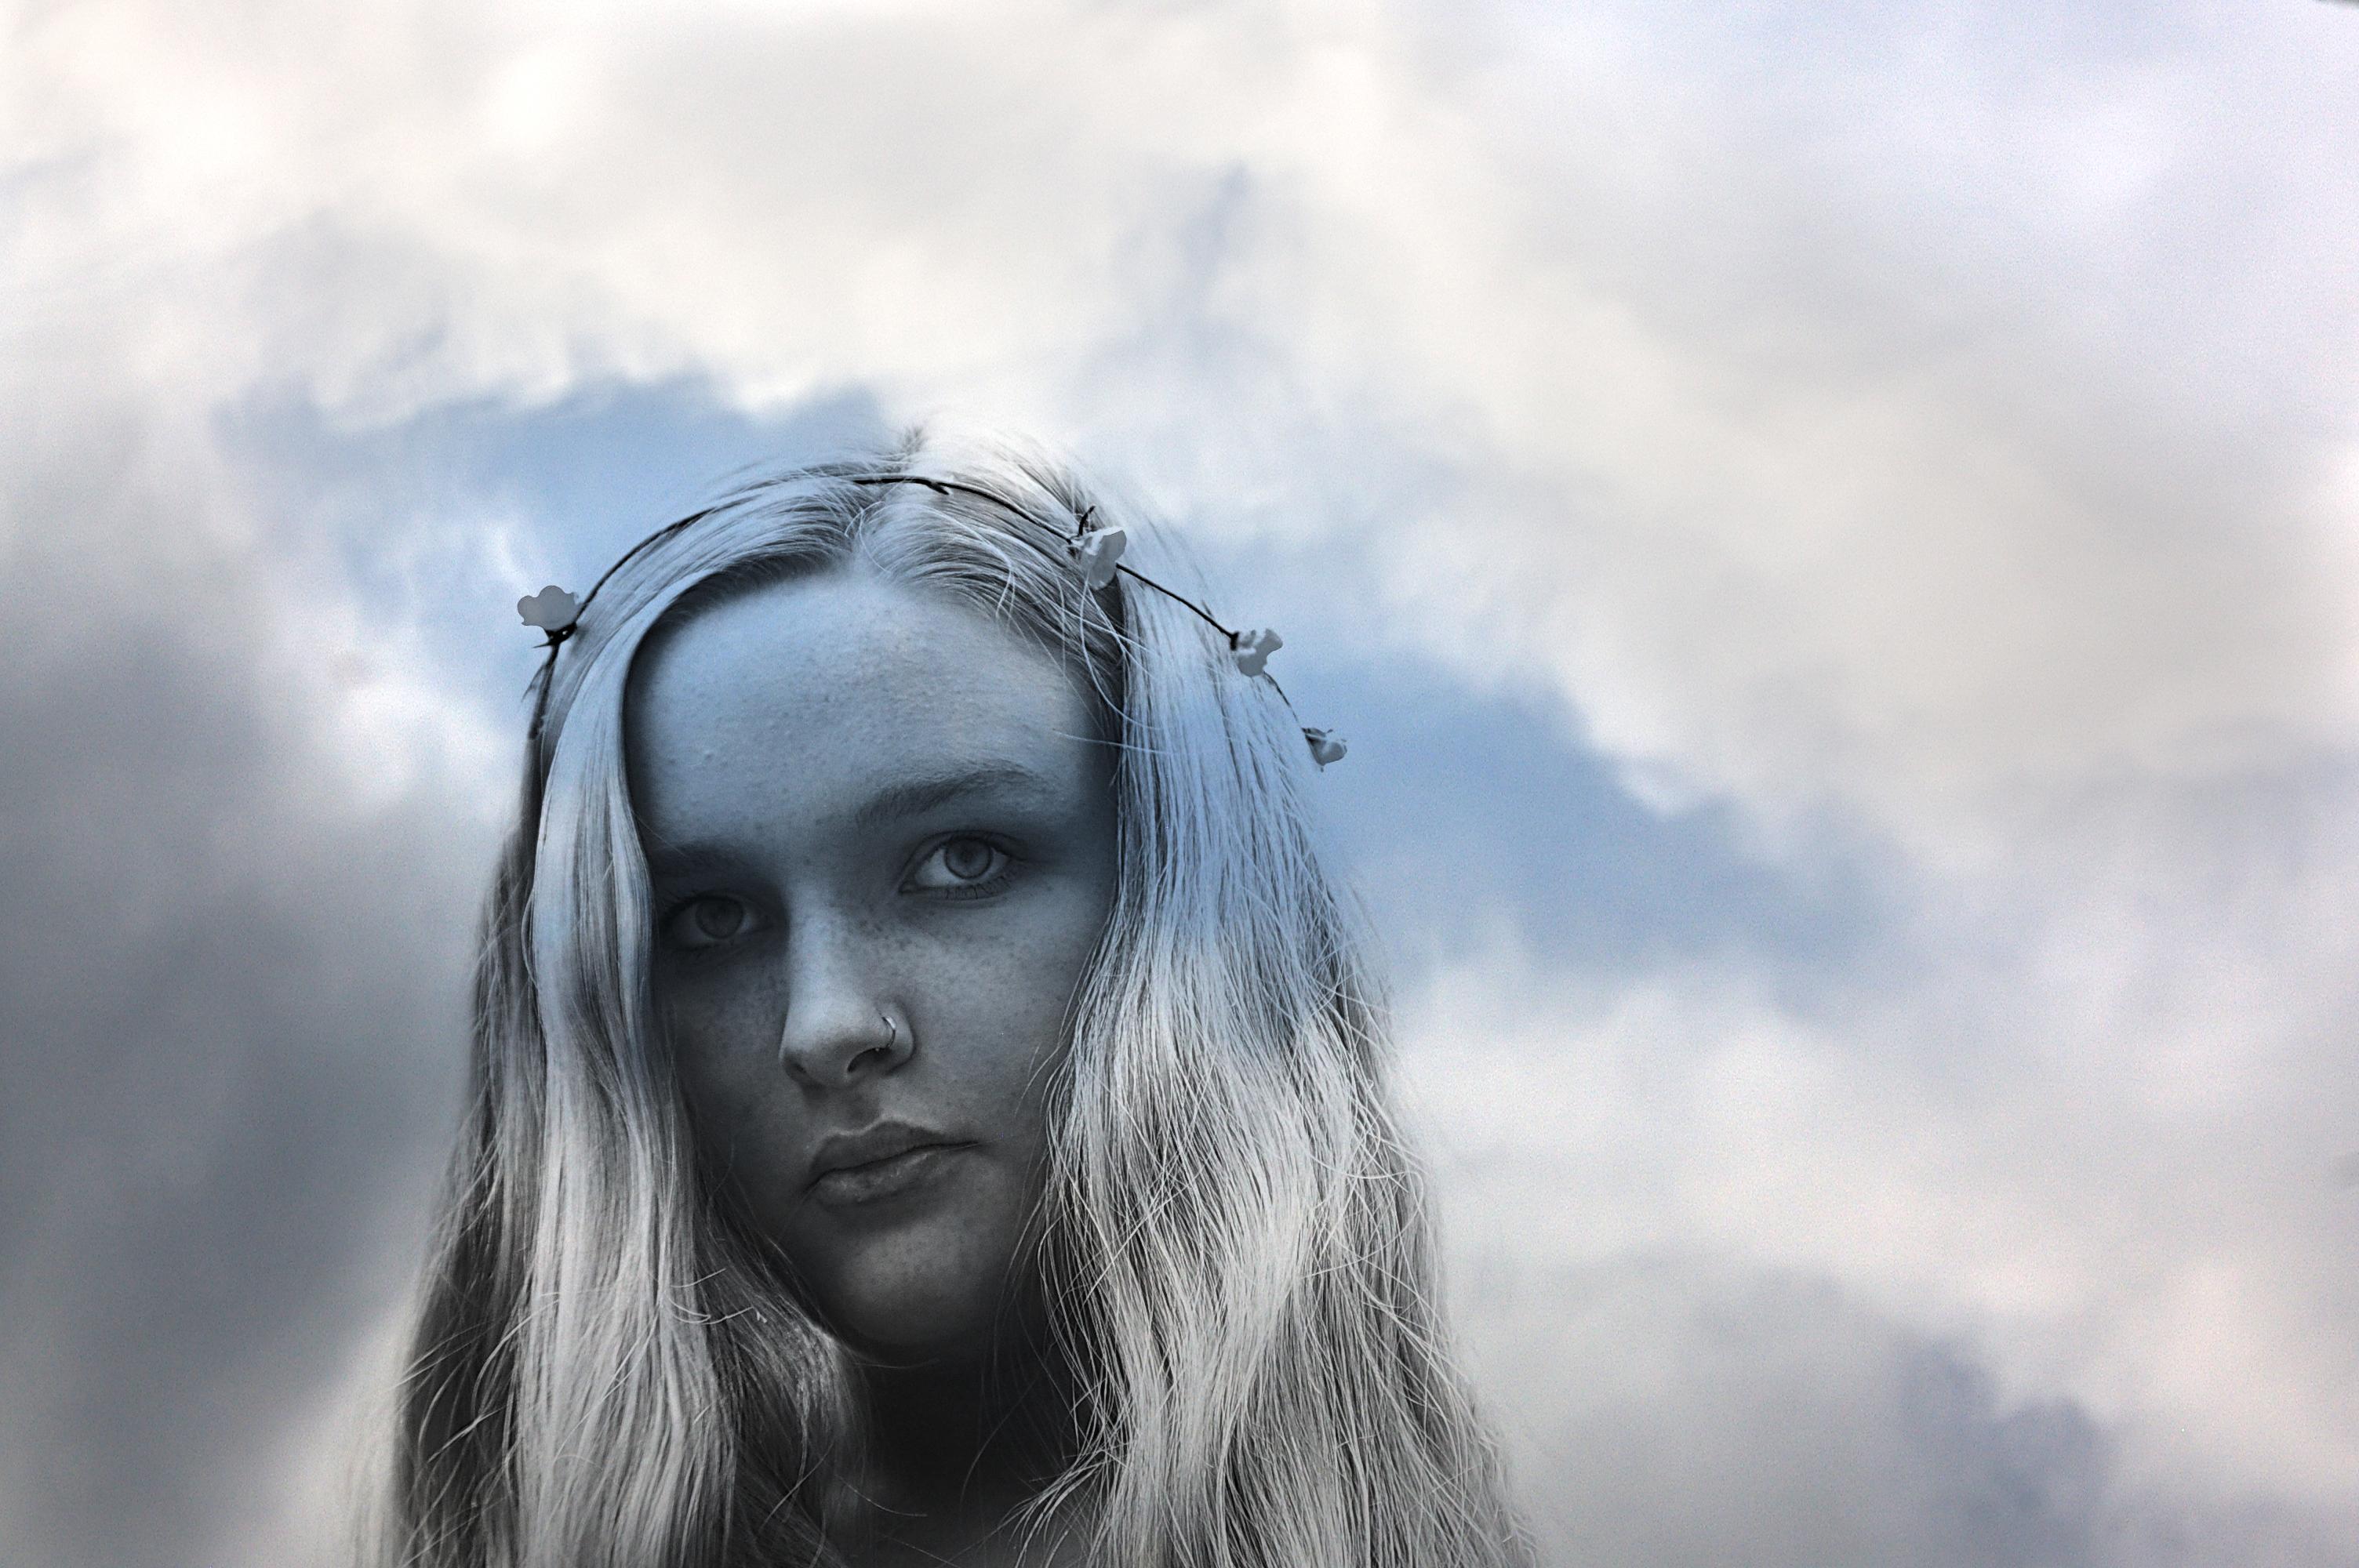 Wonder-Alyssa Williams